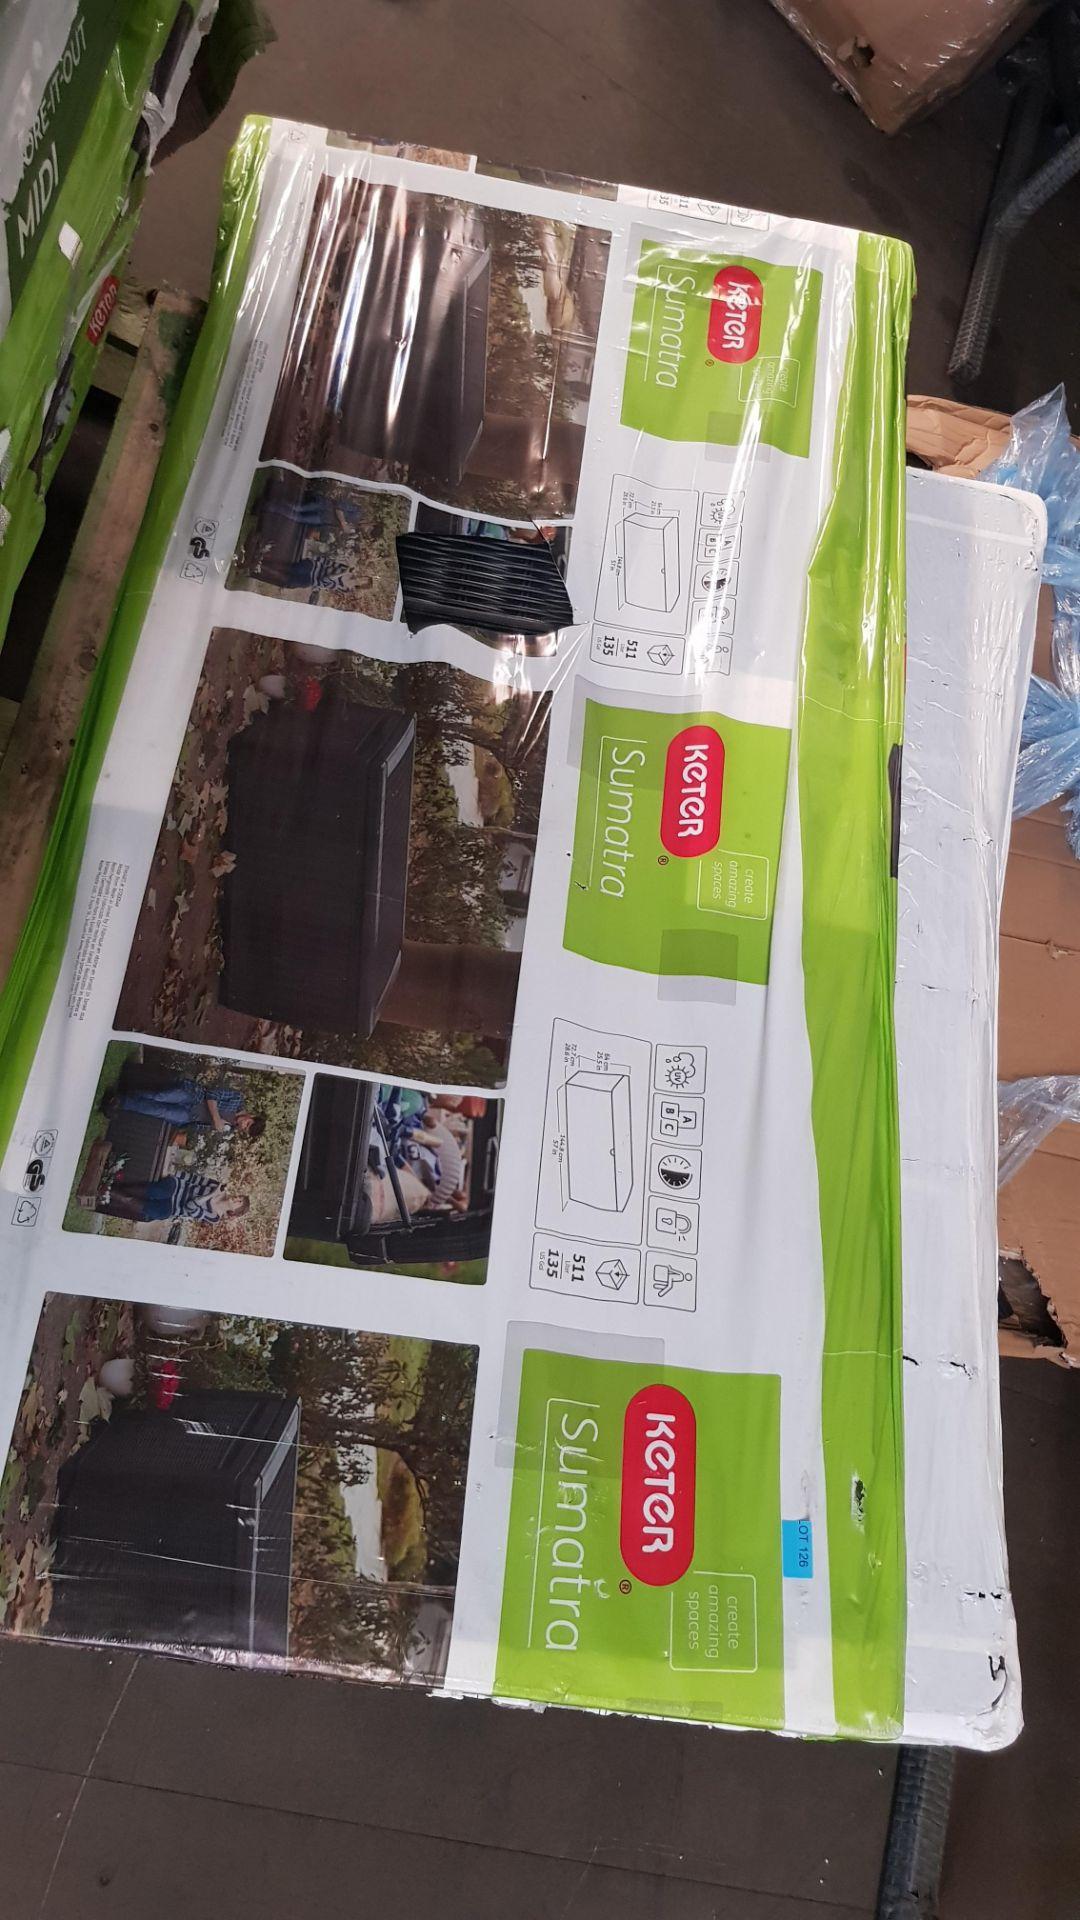 (P1) 1x Keter Sumatra 511L. RRP £149.95. (H64x W145x D73cm) - Image 3 of 5